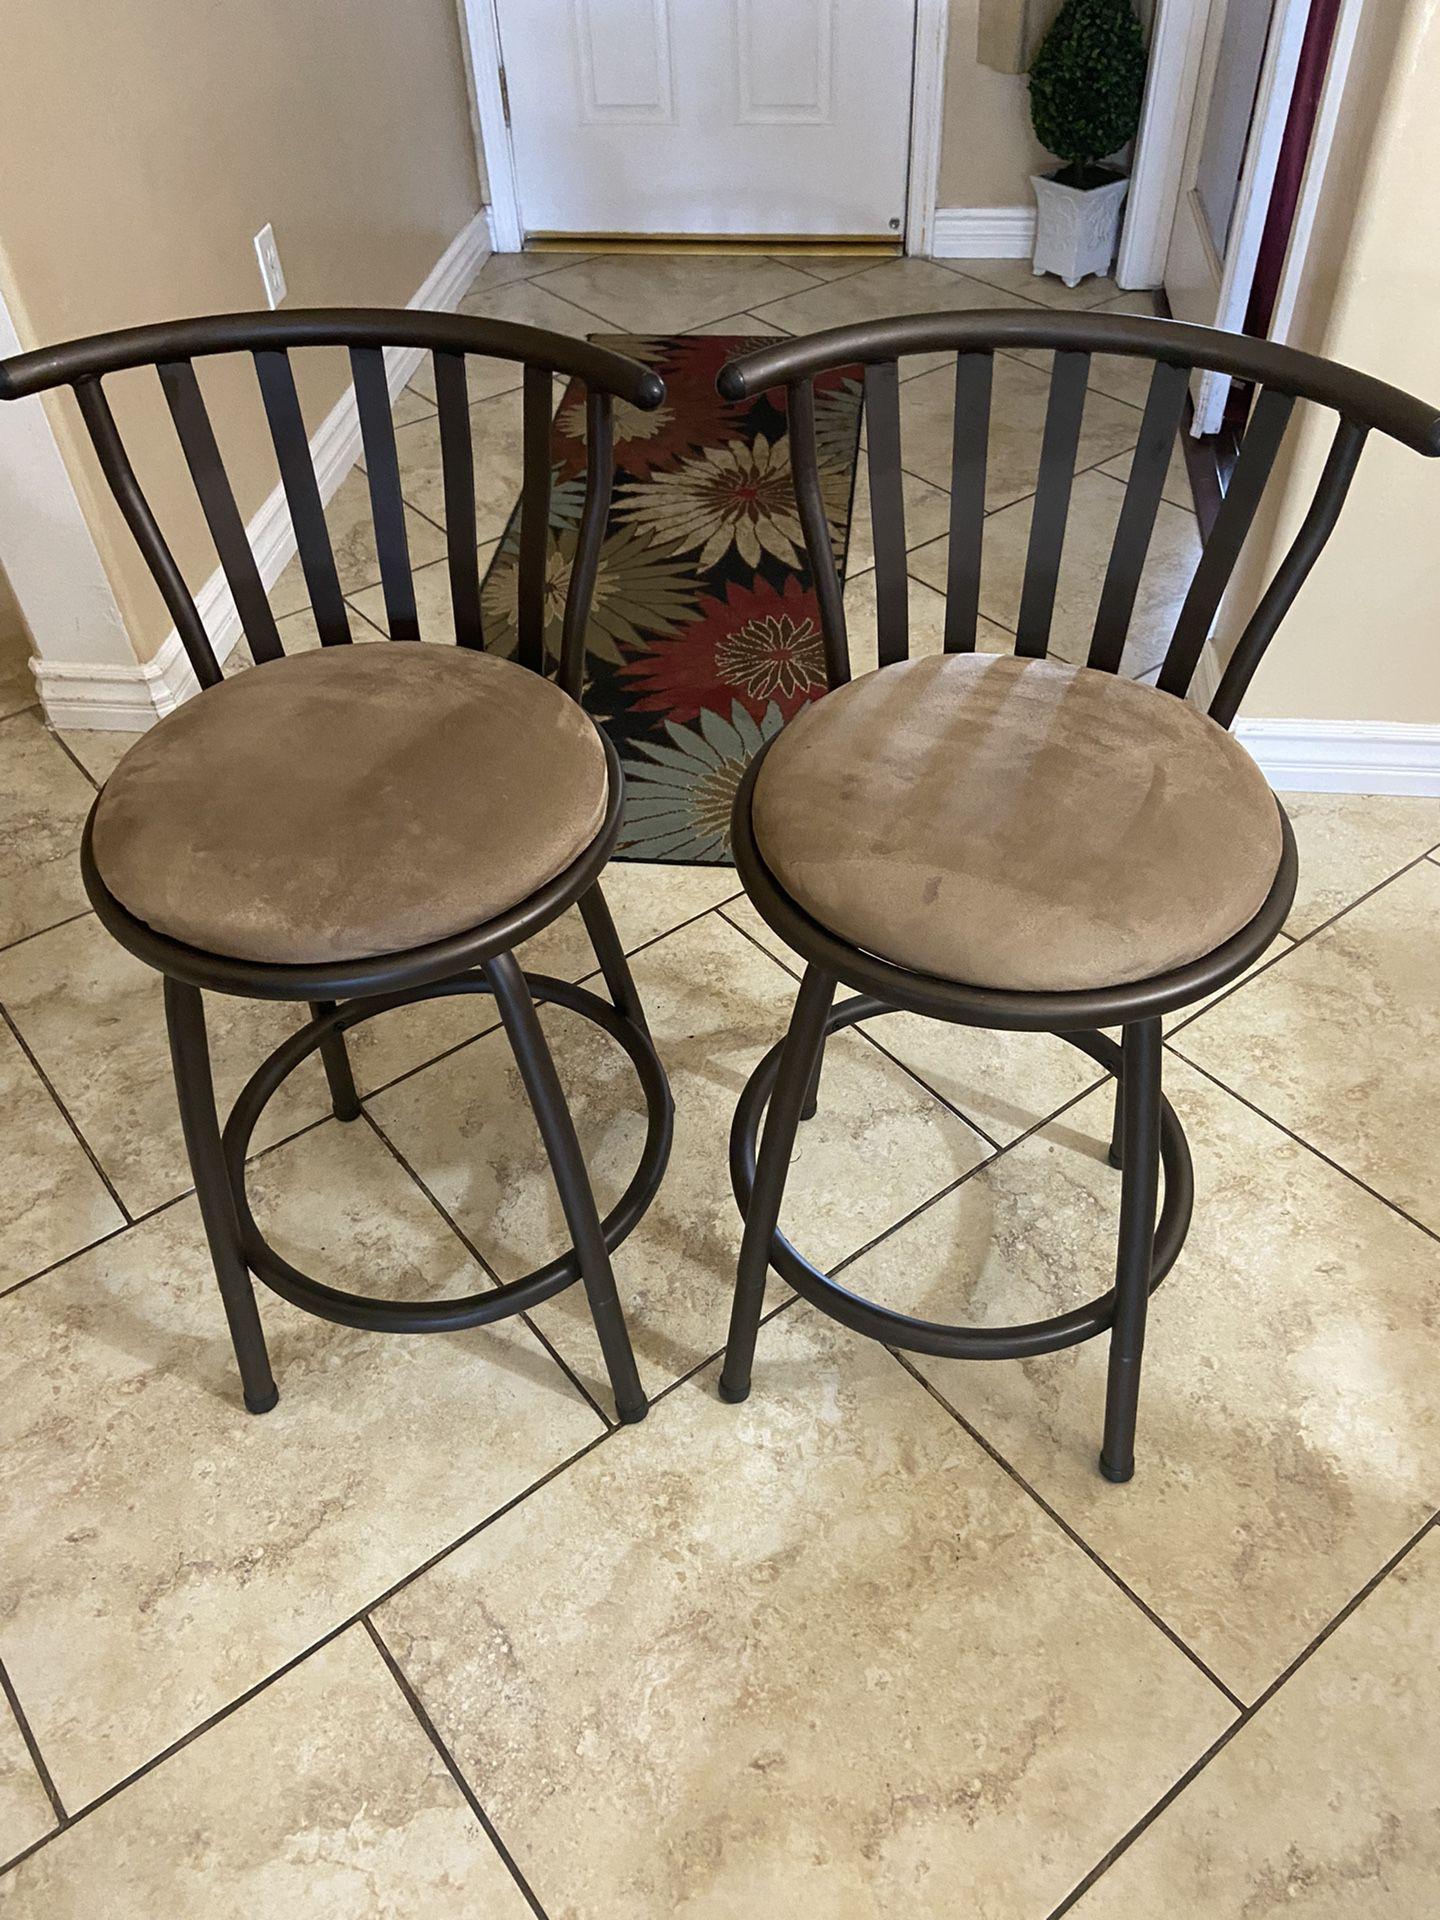 2 Barstools